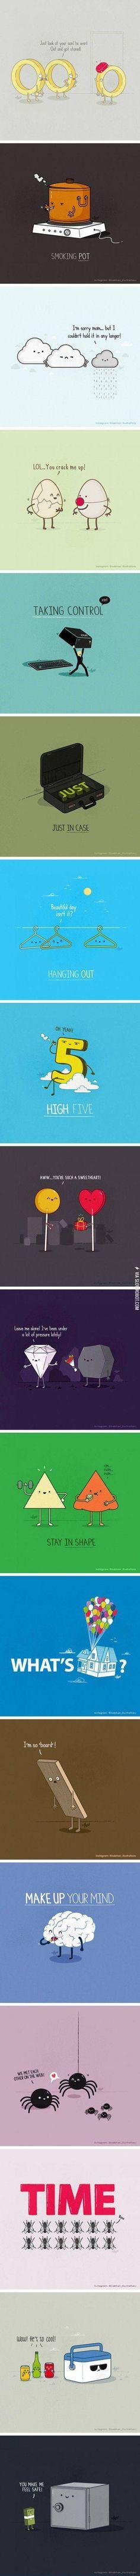 Cartoon puns